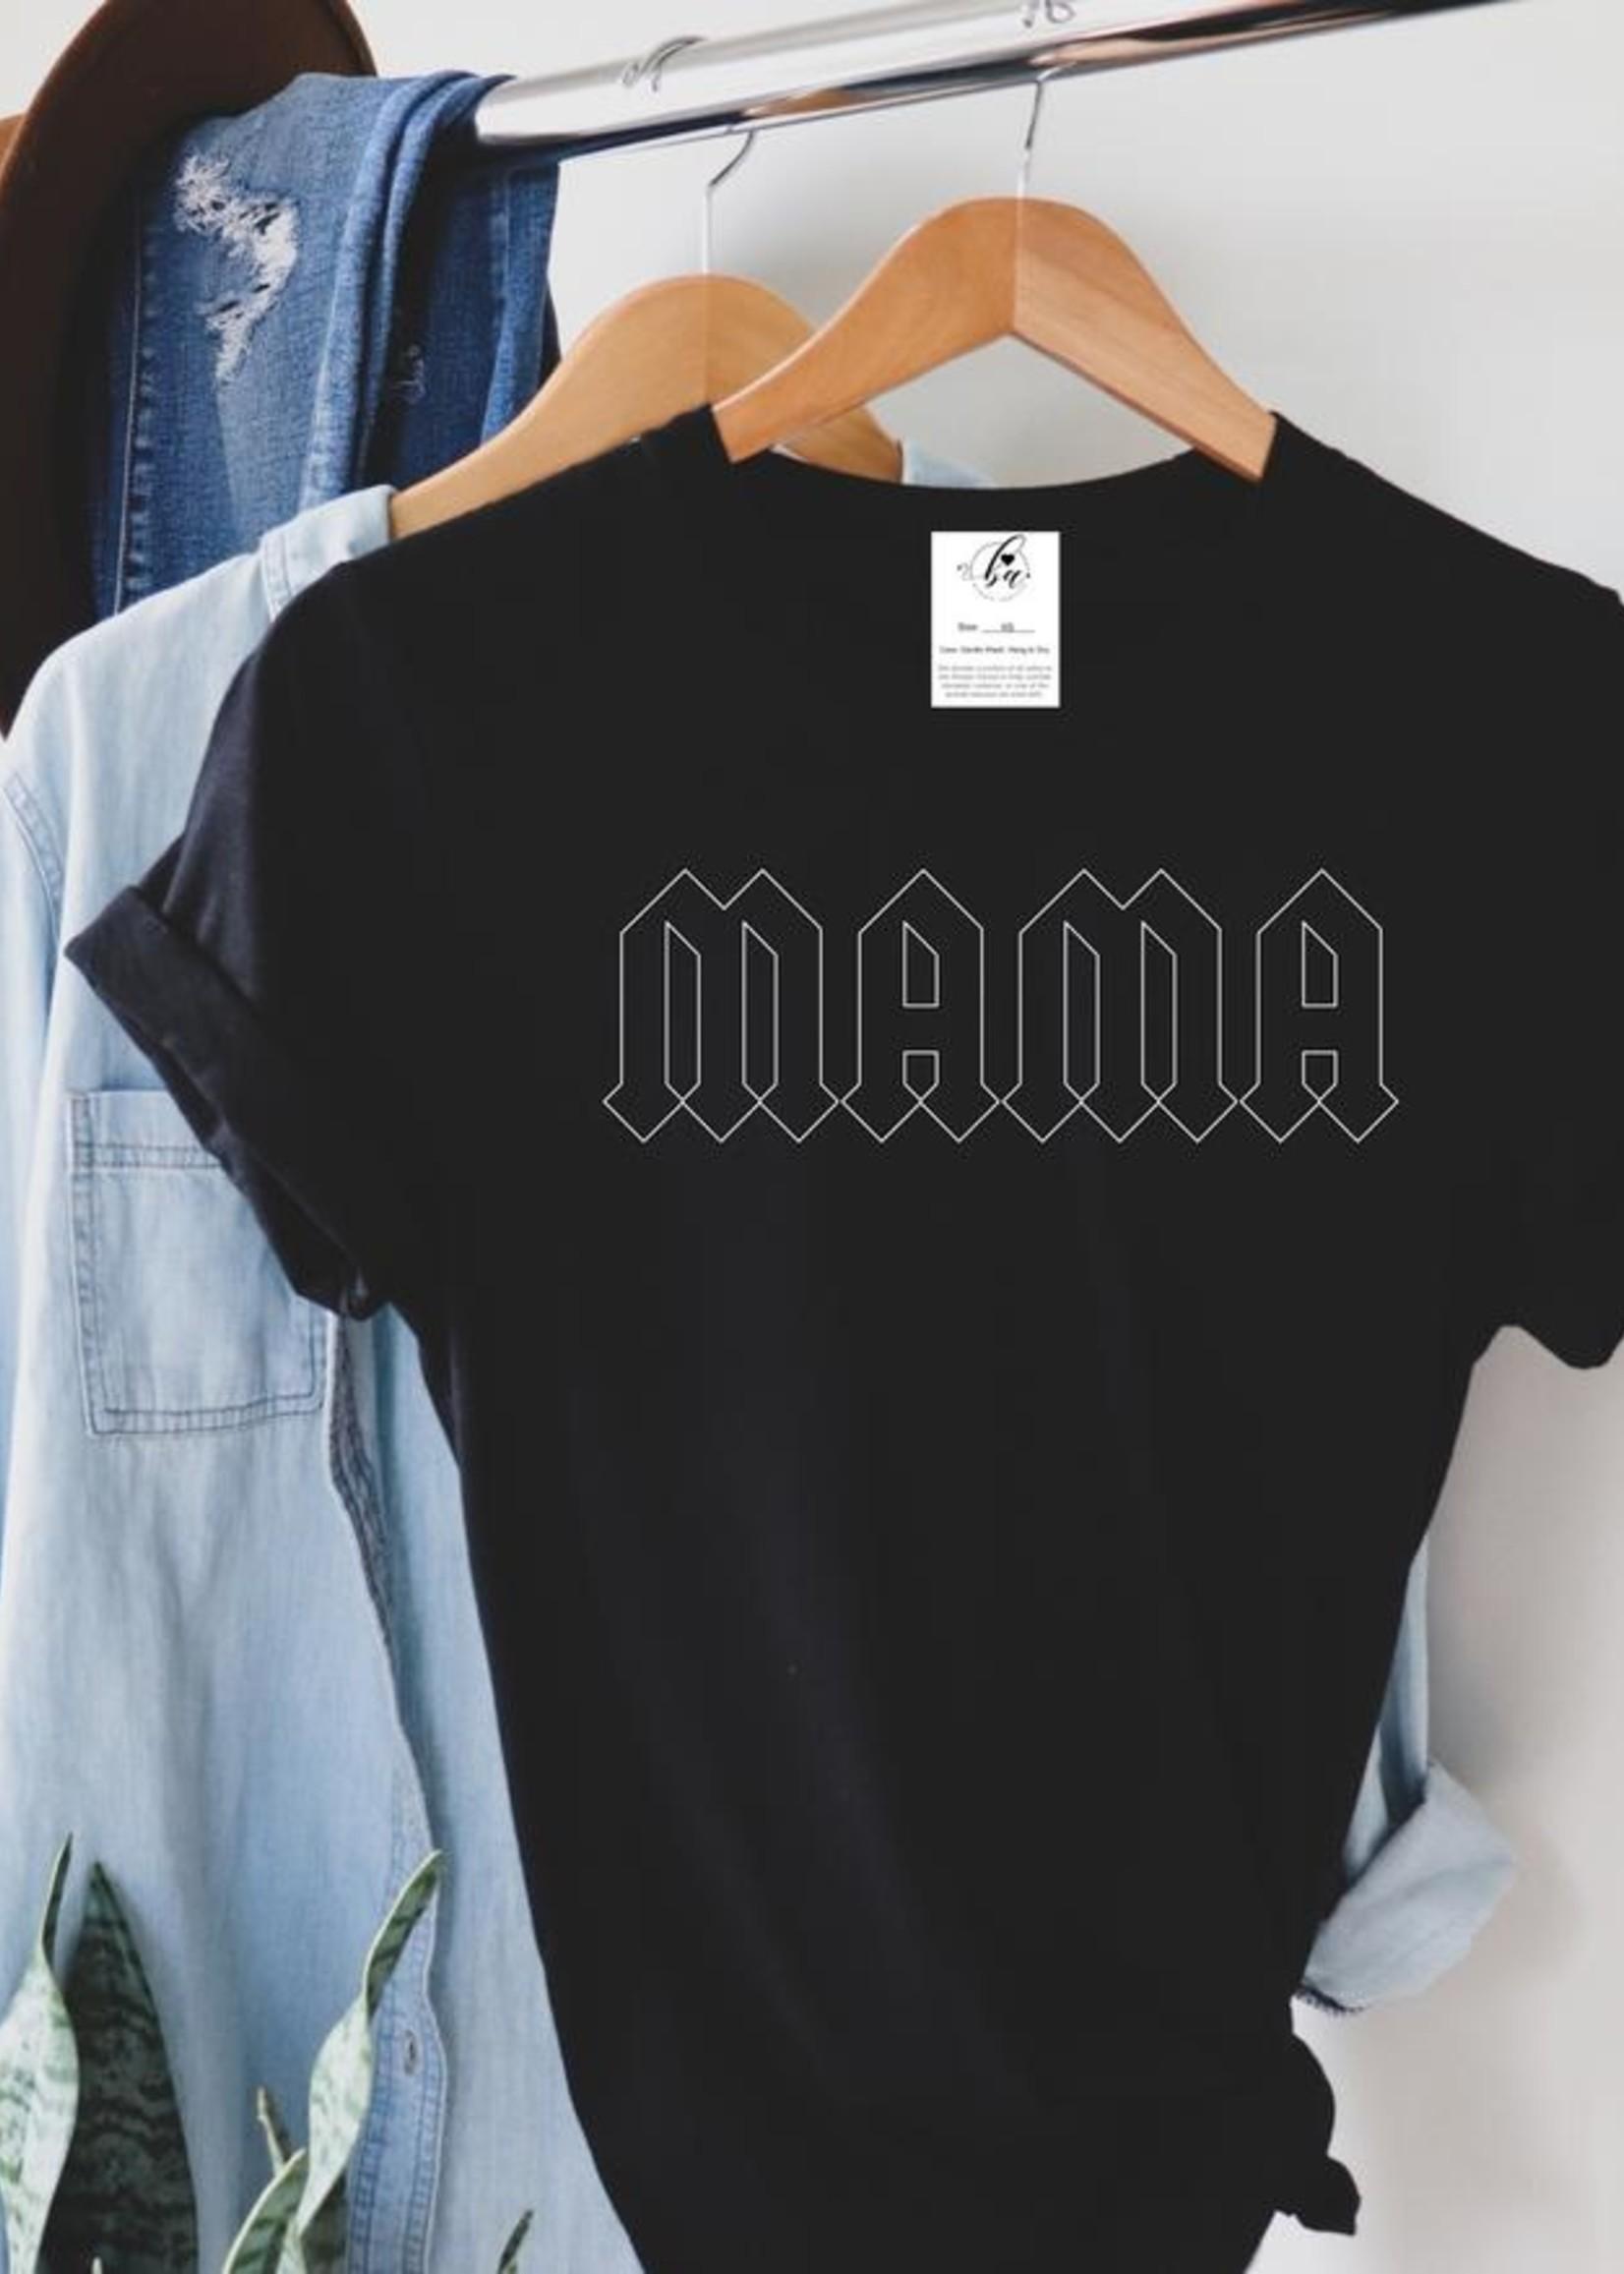 Blonde Ambition Edgy Mama T-Shirt